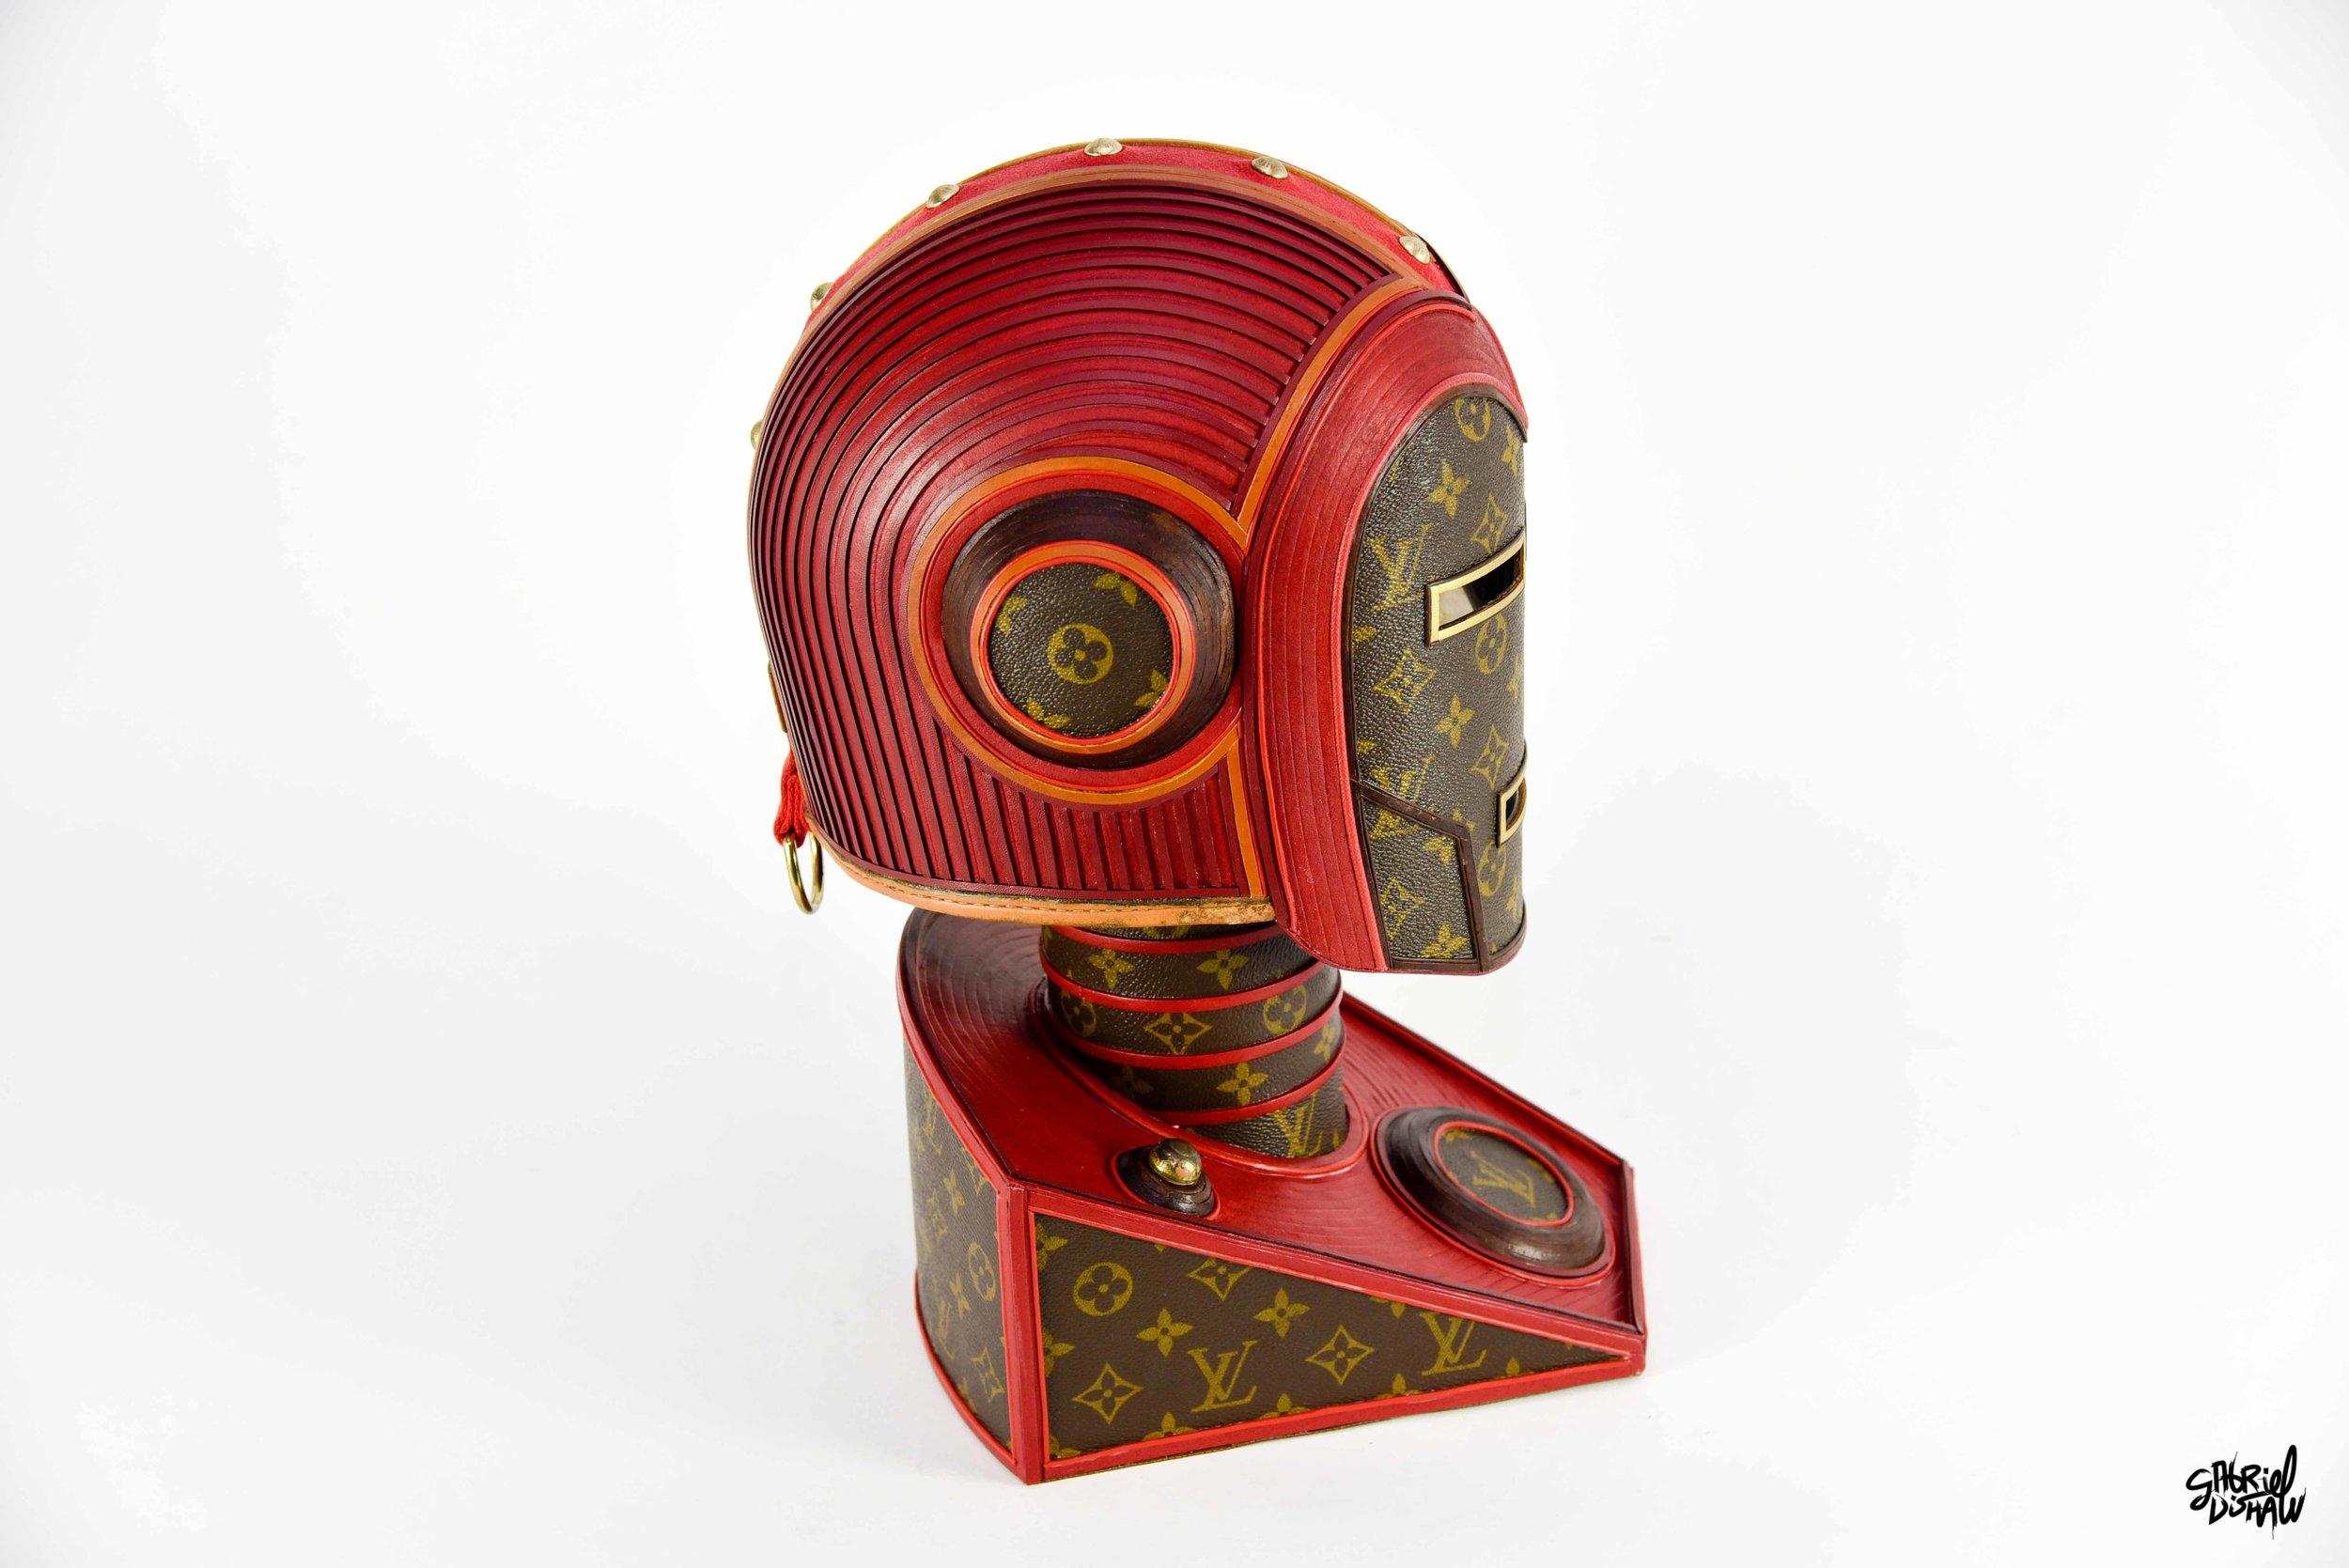 Gabriel Dishaw Vintage Iron Man LV-0053.jpg